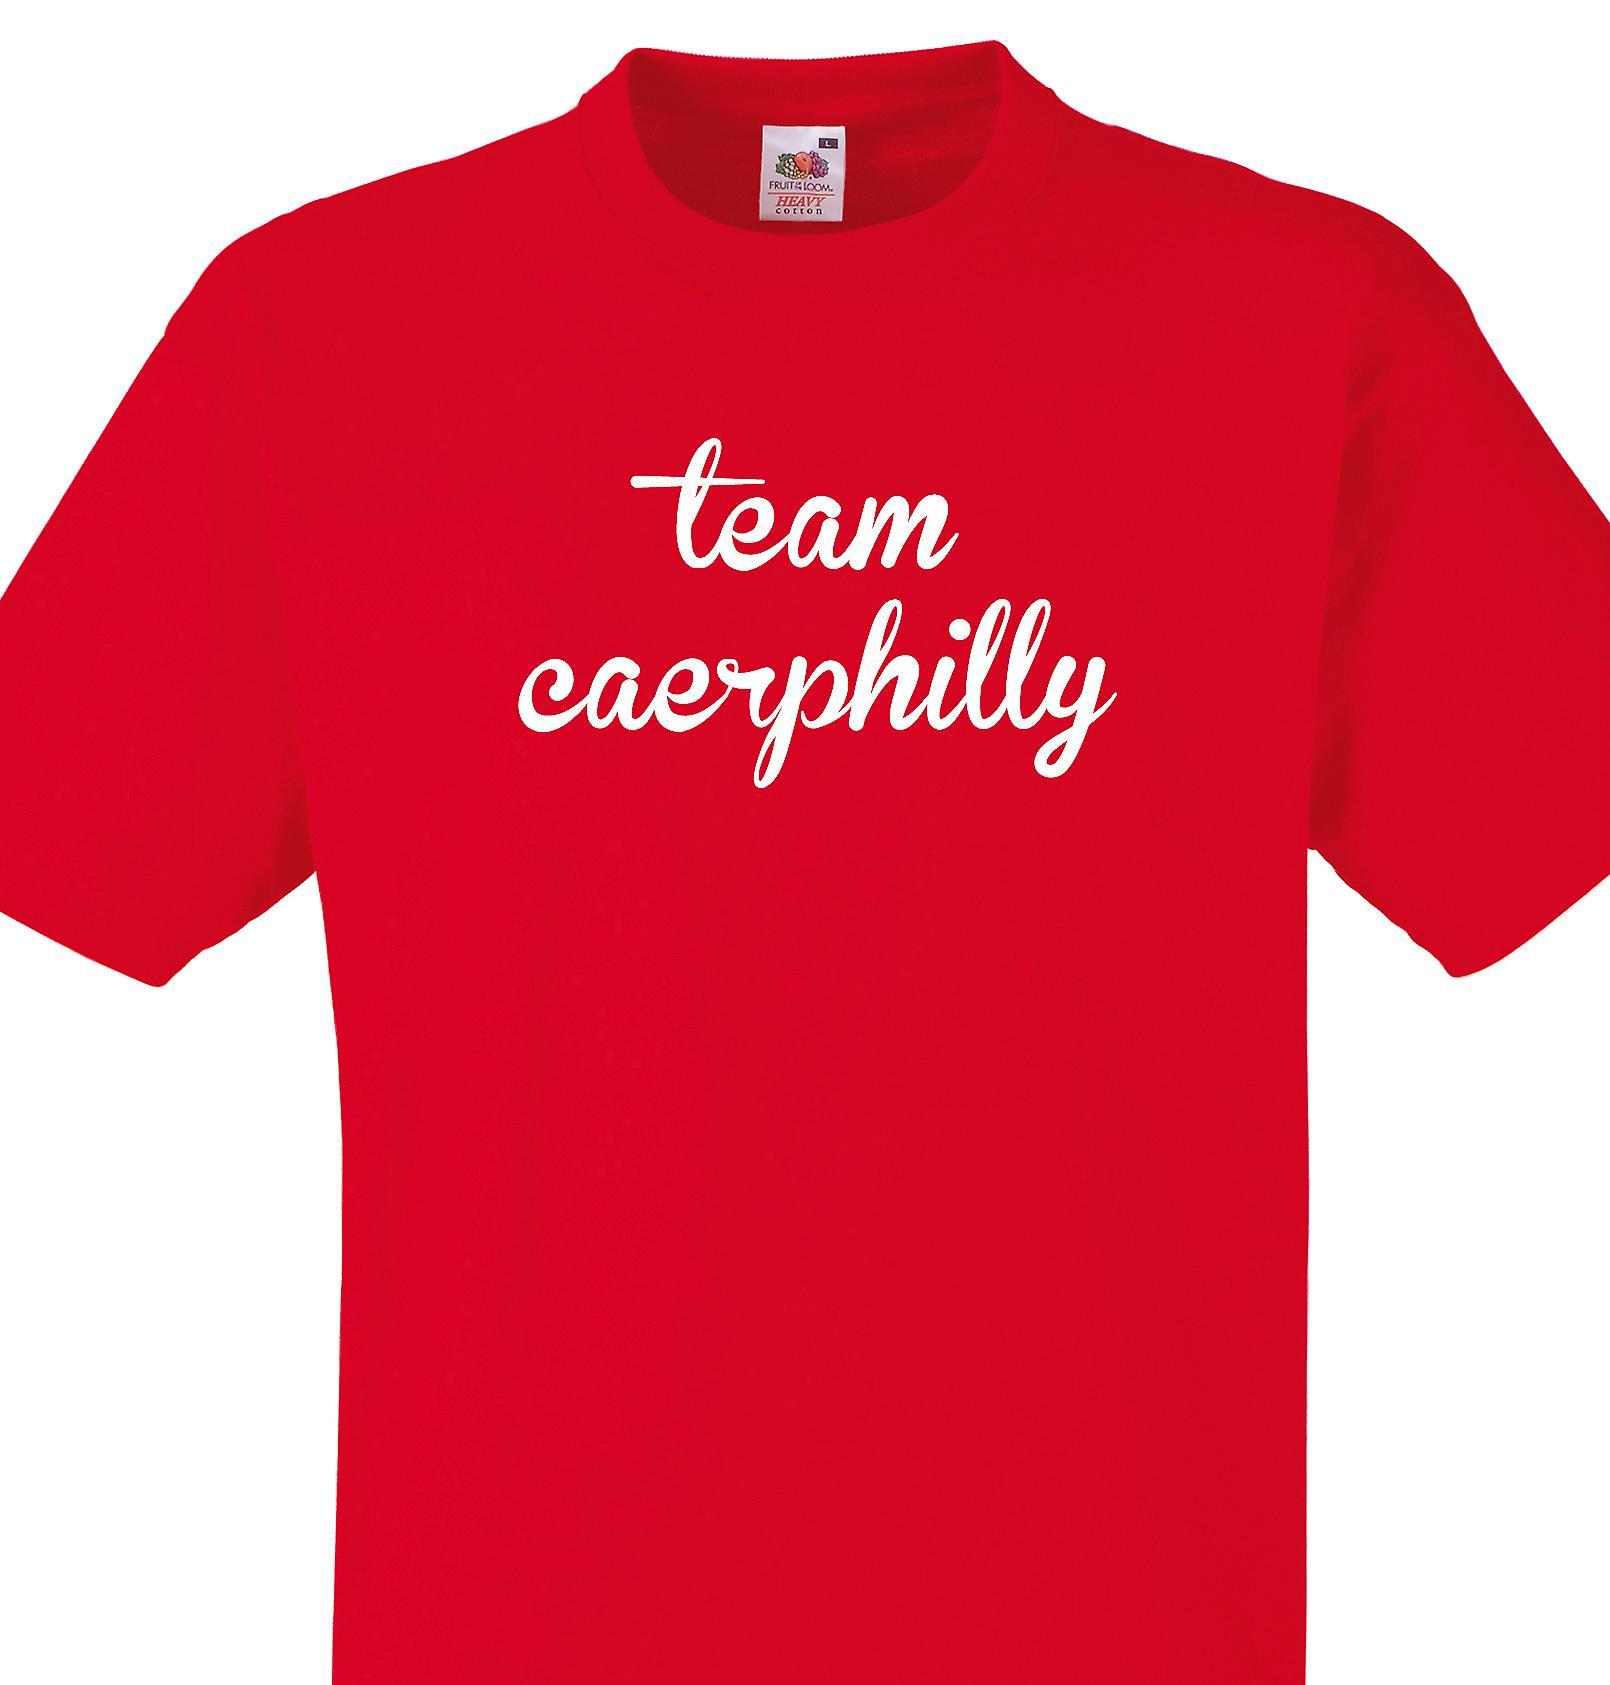 Team Caerphilly Red T shirt